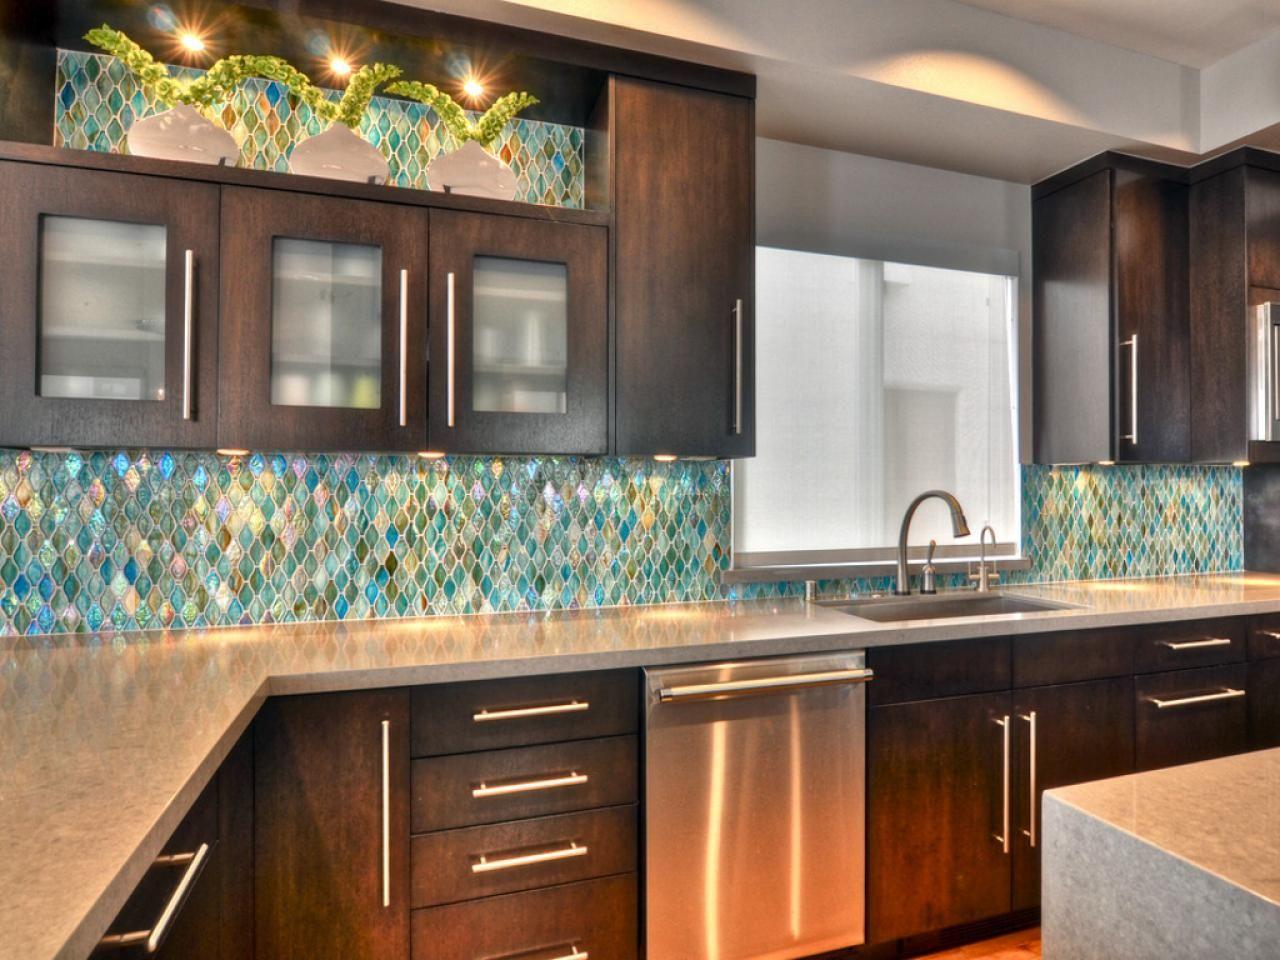 Glass backsplash ideas pictures u tips from kitchen pinterest